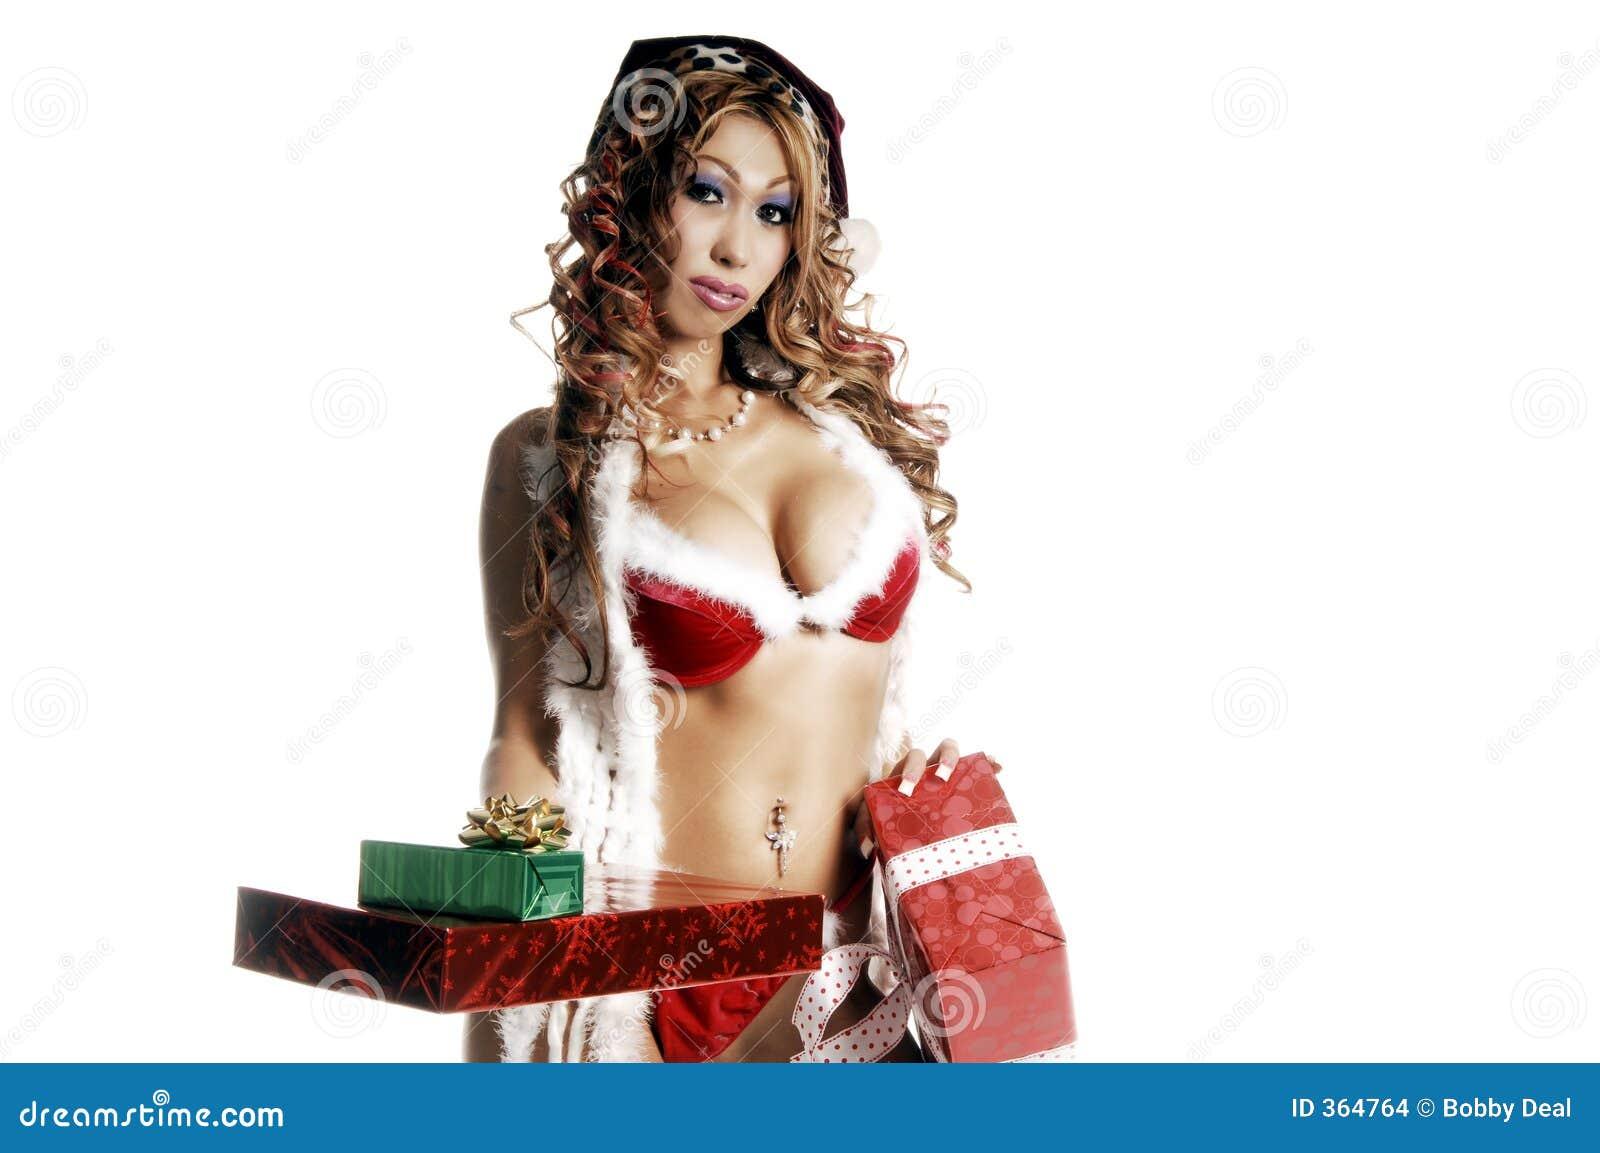 sexy indo girls nude